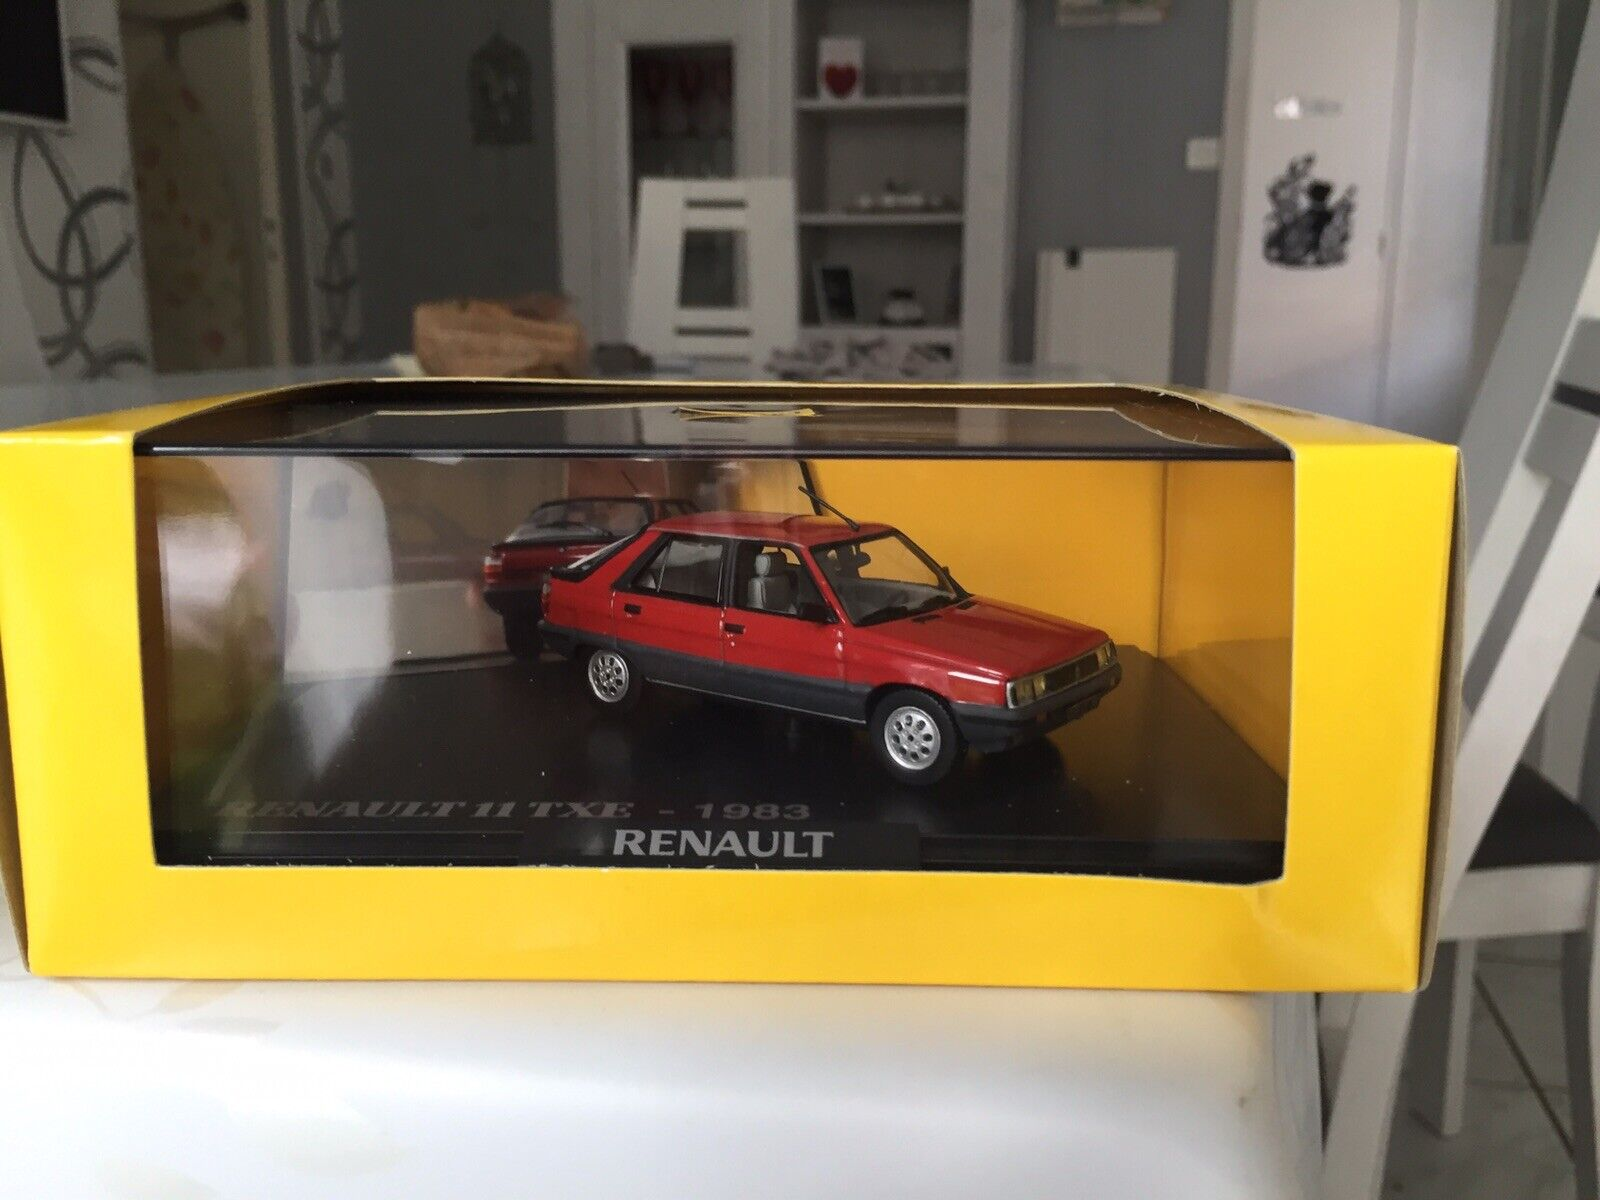 Renault 11 TXE 1983 - Norev - 1:43 - ref Renault Boutique 7711237472